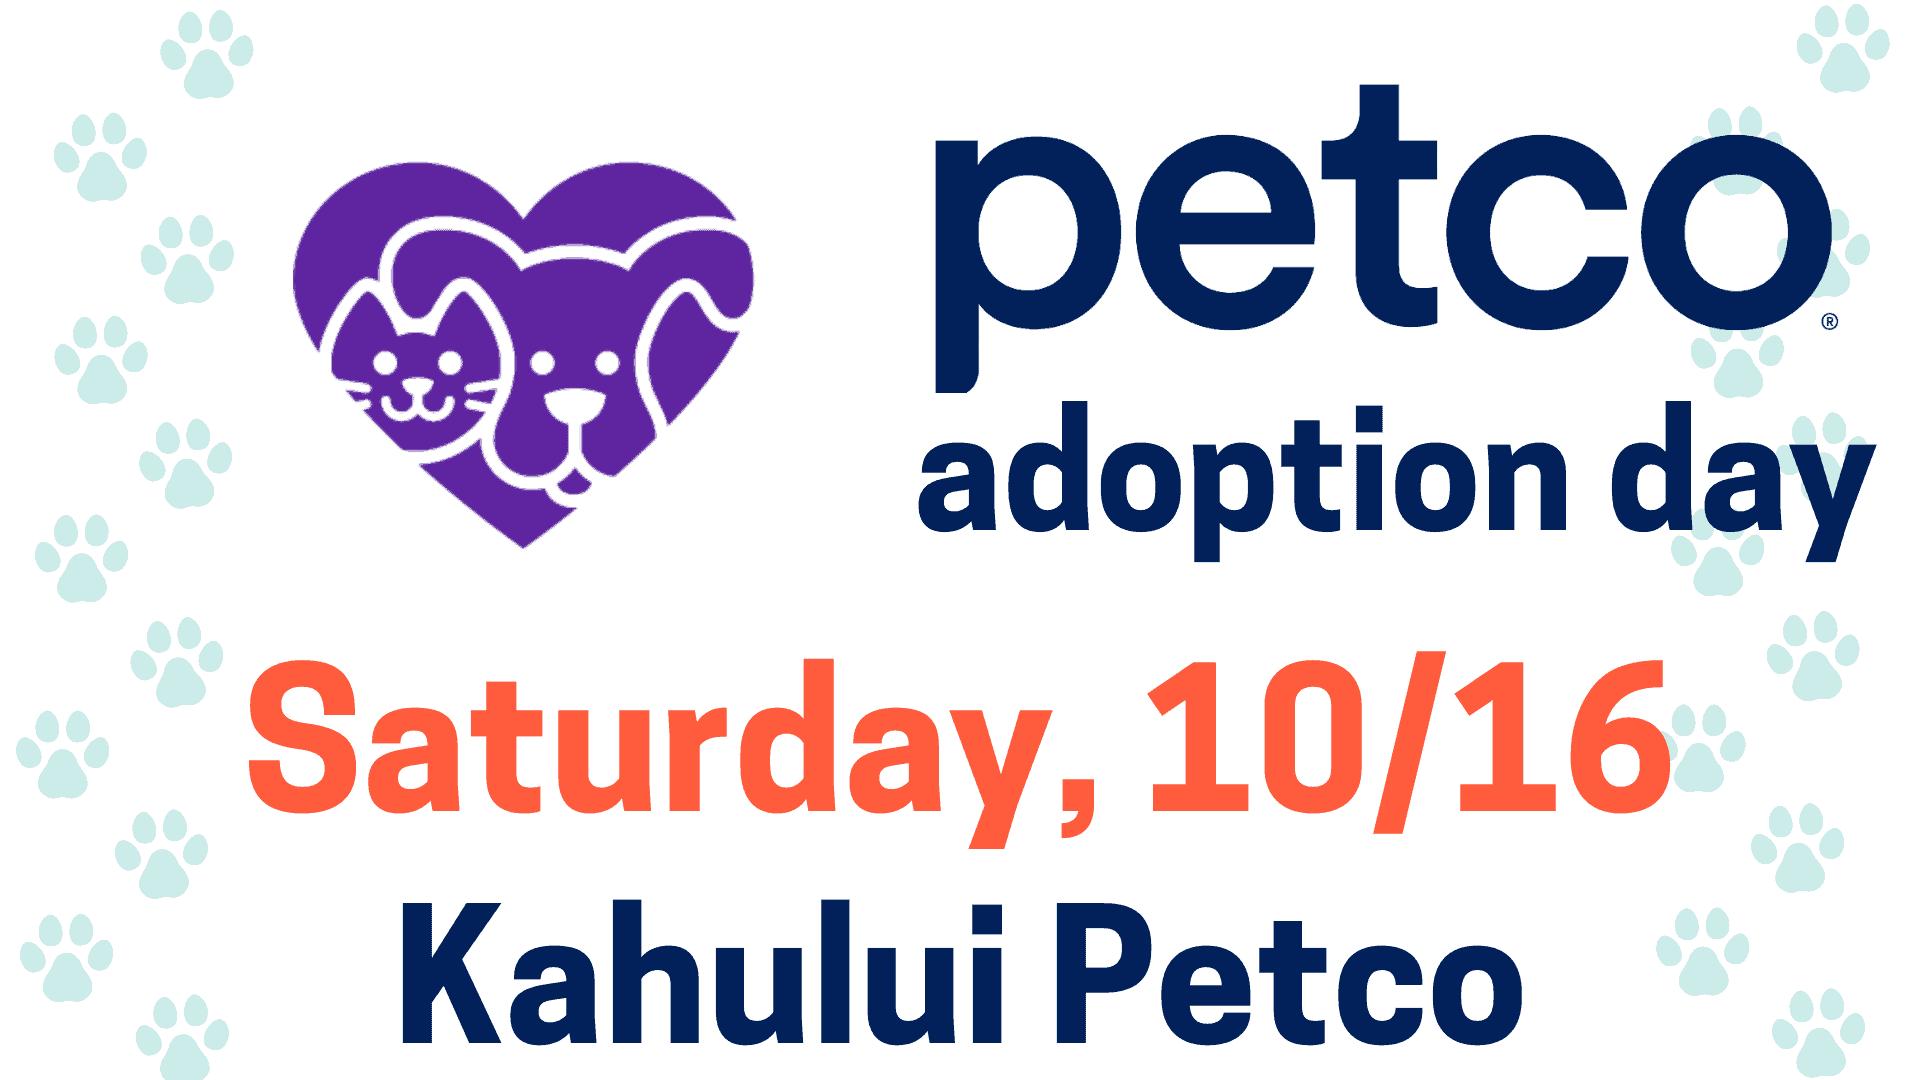 Petco Adoption Day Saturday 10/16